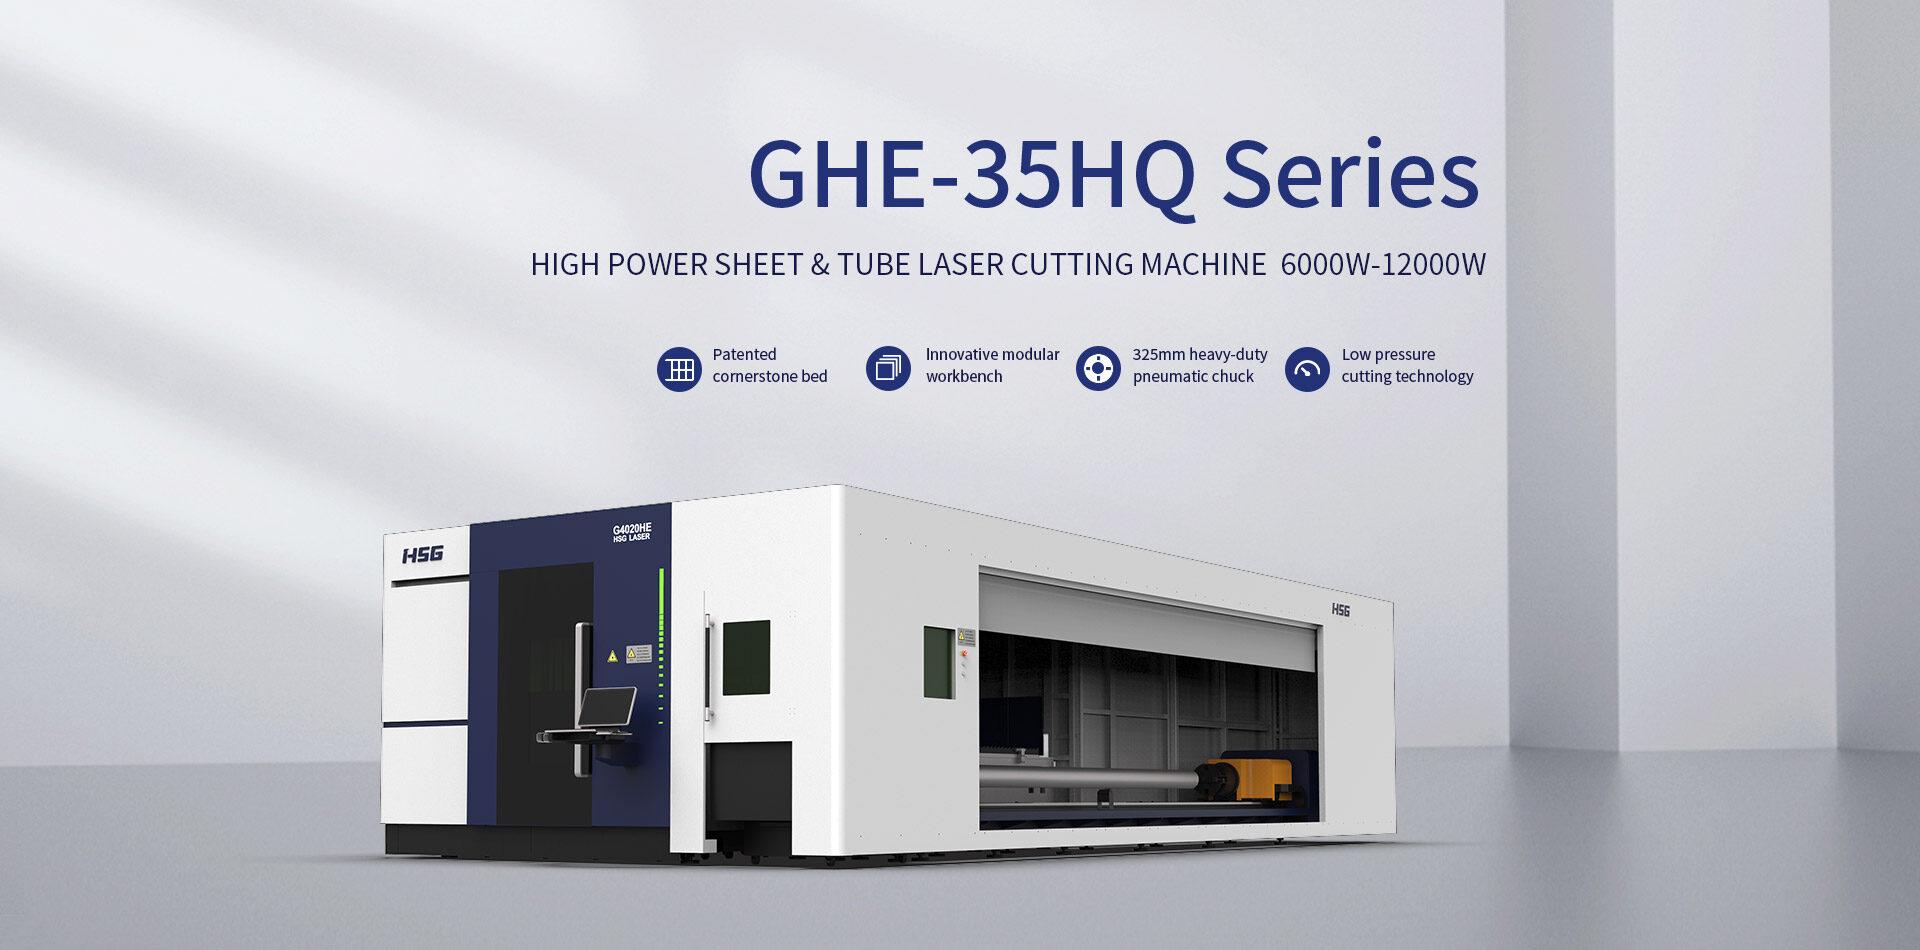 Máy cắt laser fiber HSG dòng GHE